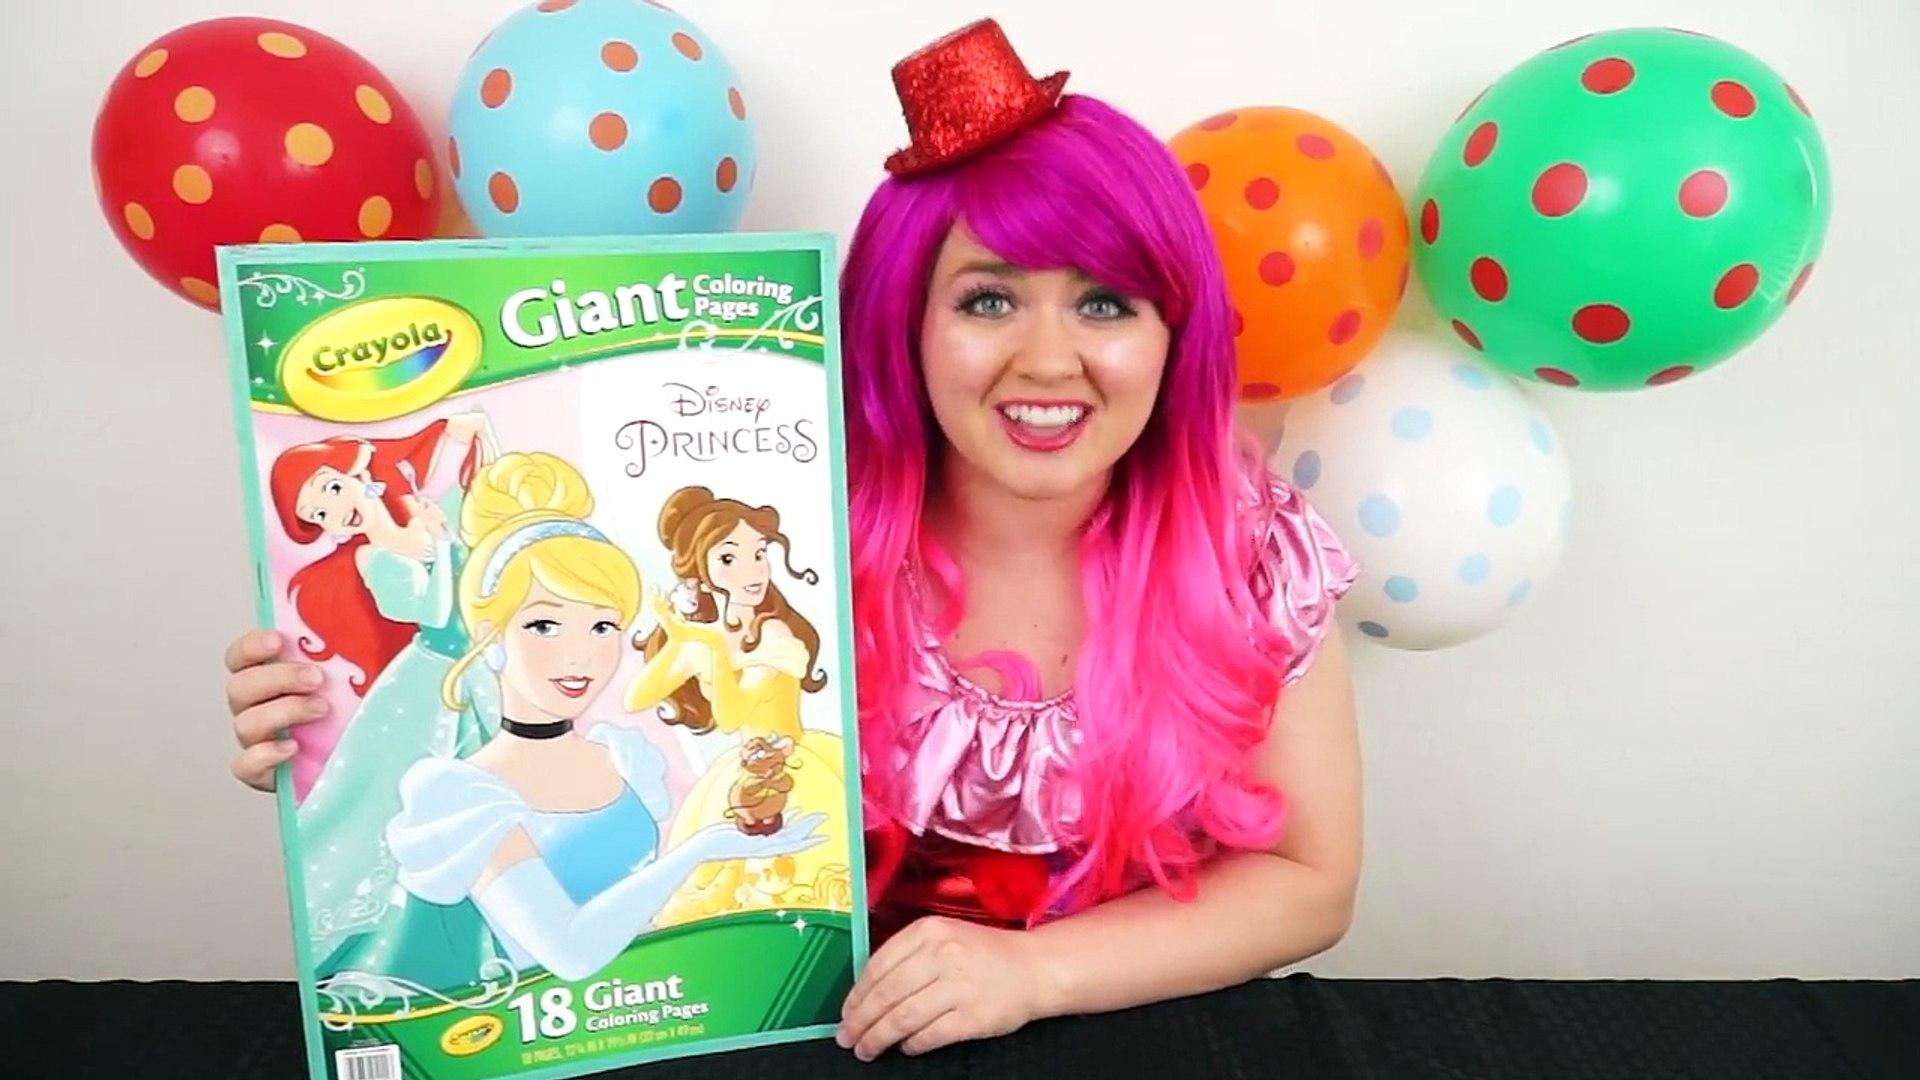 Coloring Cinderella Disney Princess GIANT Coloring Book Page Colored Pencil | KiMMi THE CLOWN